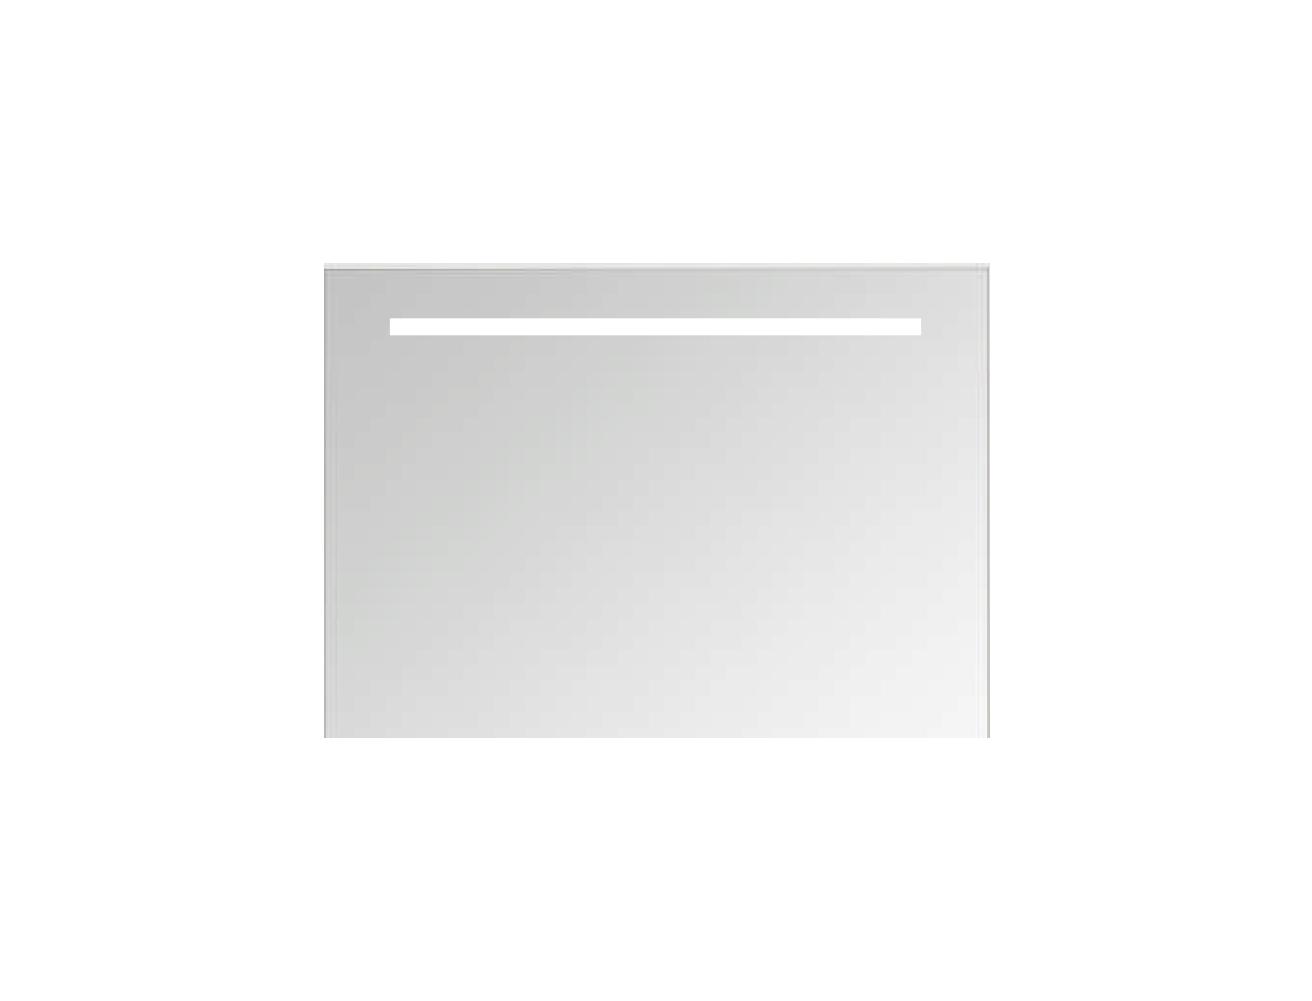 Basic spiegel op alu frame met geintegreerde led verlichting - 600x30mm (bxd)